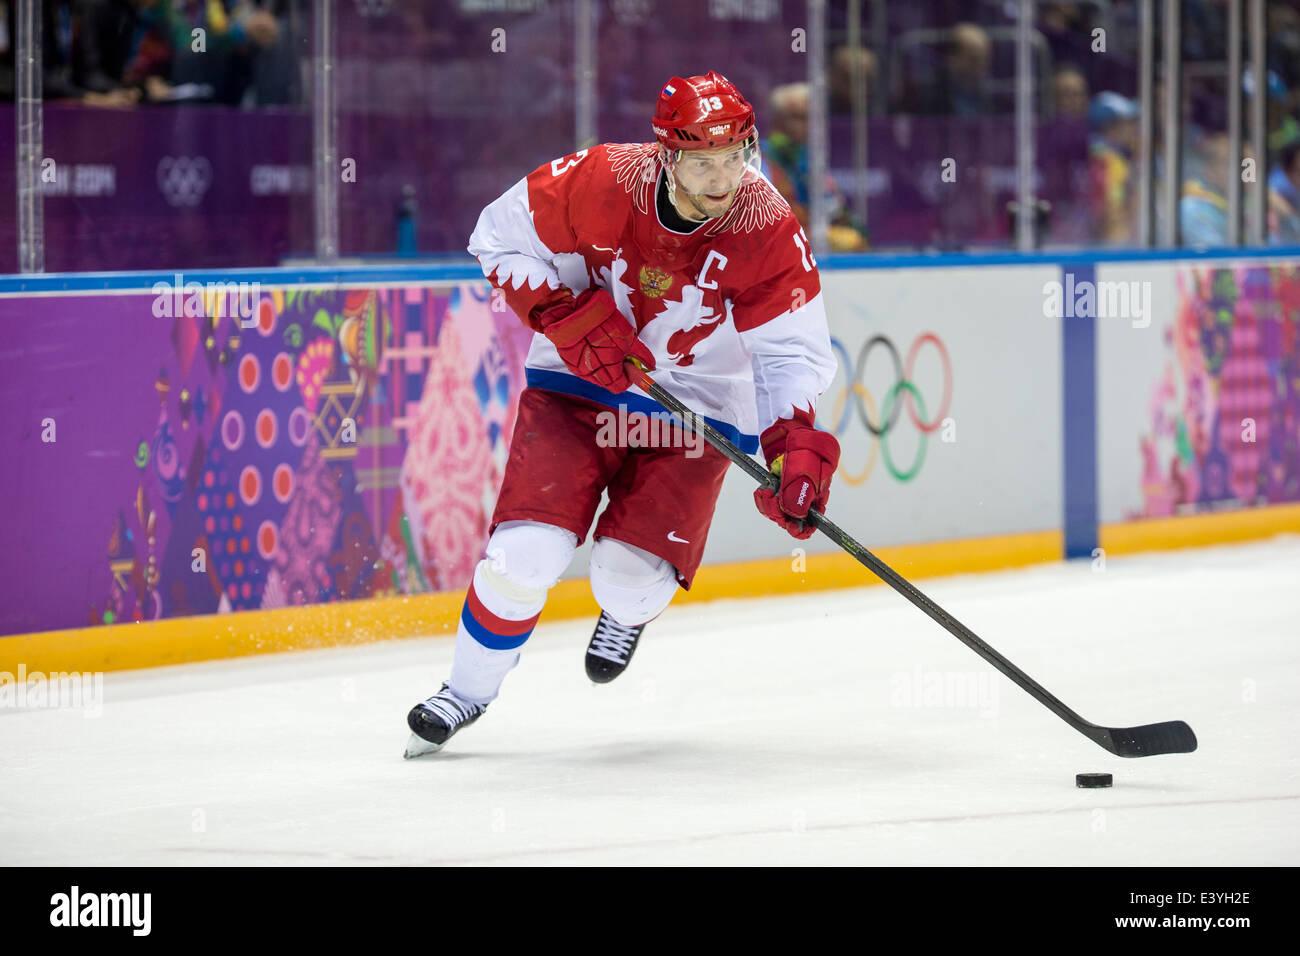 Pavel datsyuk rus during ice hockey game vs usa at the olympic pavel datsyuk rus during ice hockey game vs usa at the olympic winter games sochi 2014 voltagebd Choice Image